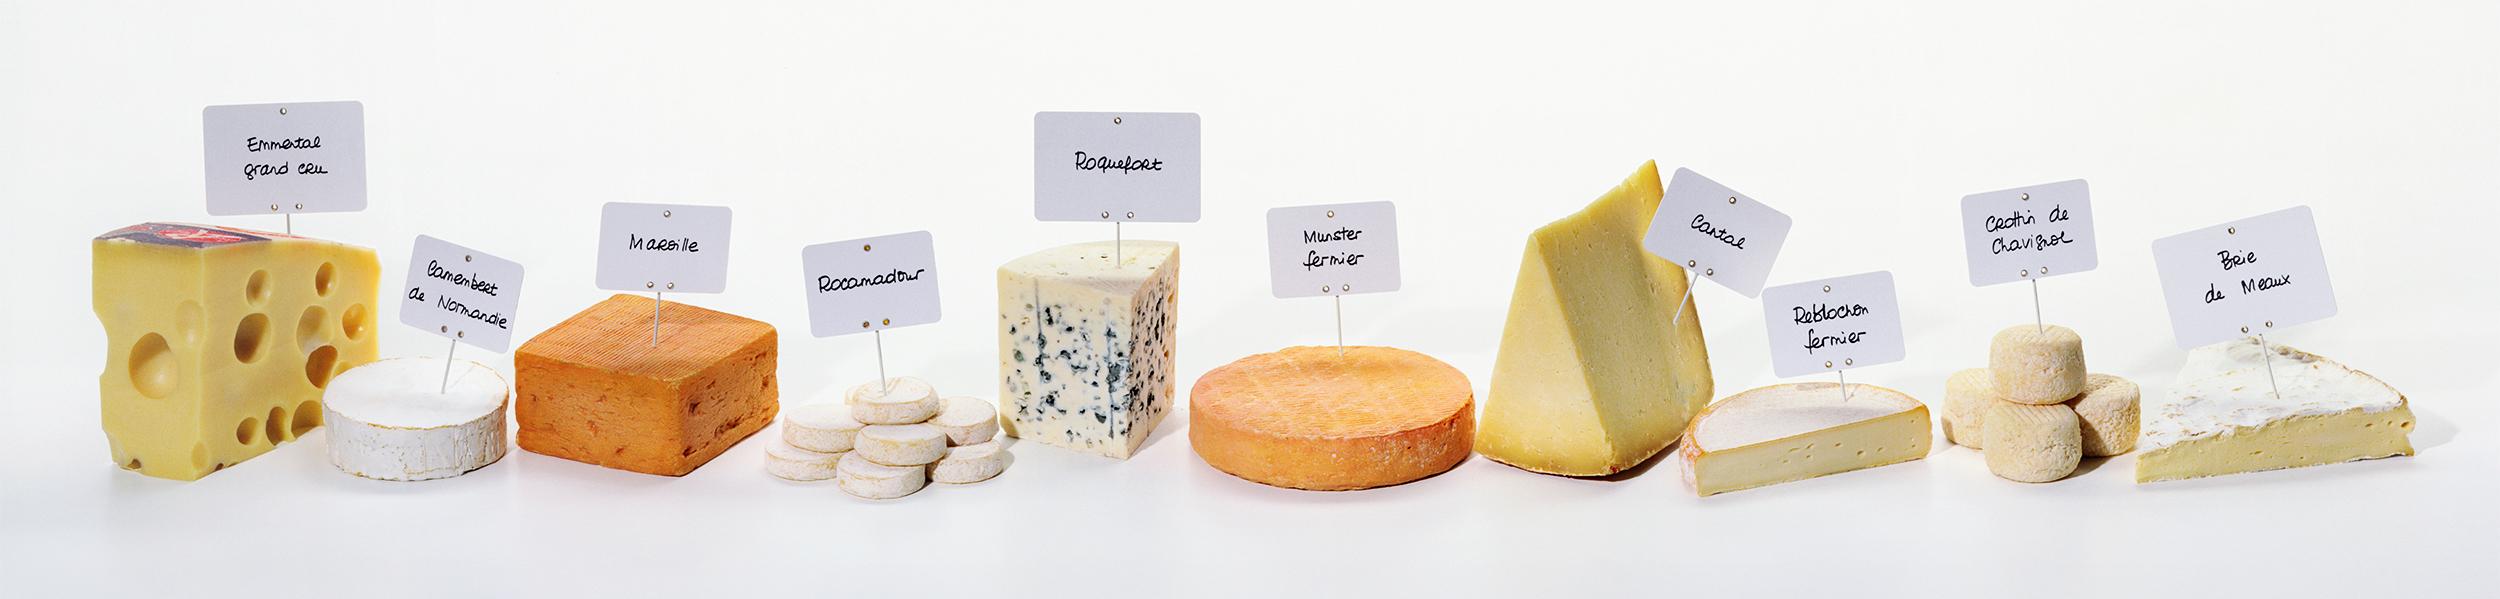 Käse aus aller Welt